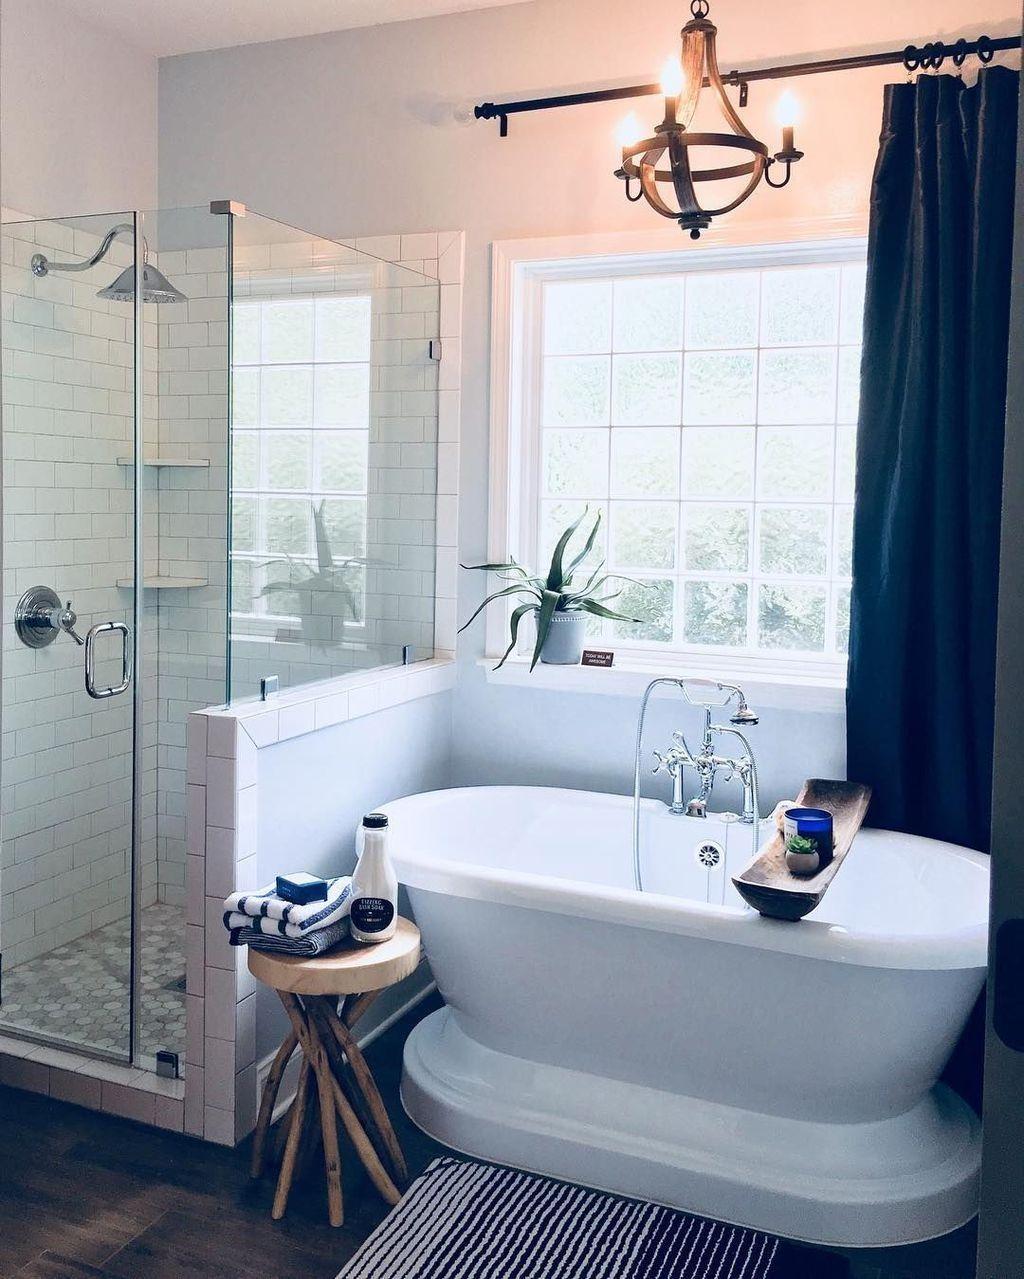 46 Beautiful Master Bathroom Remodel Design Ideas | Bathroom